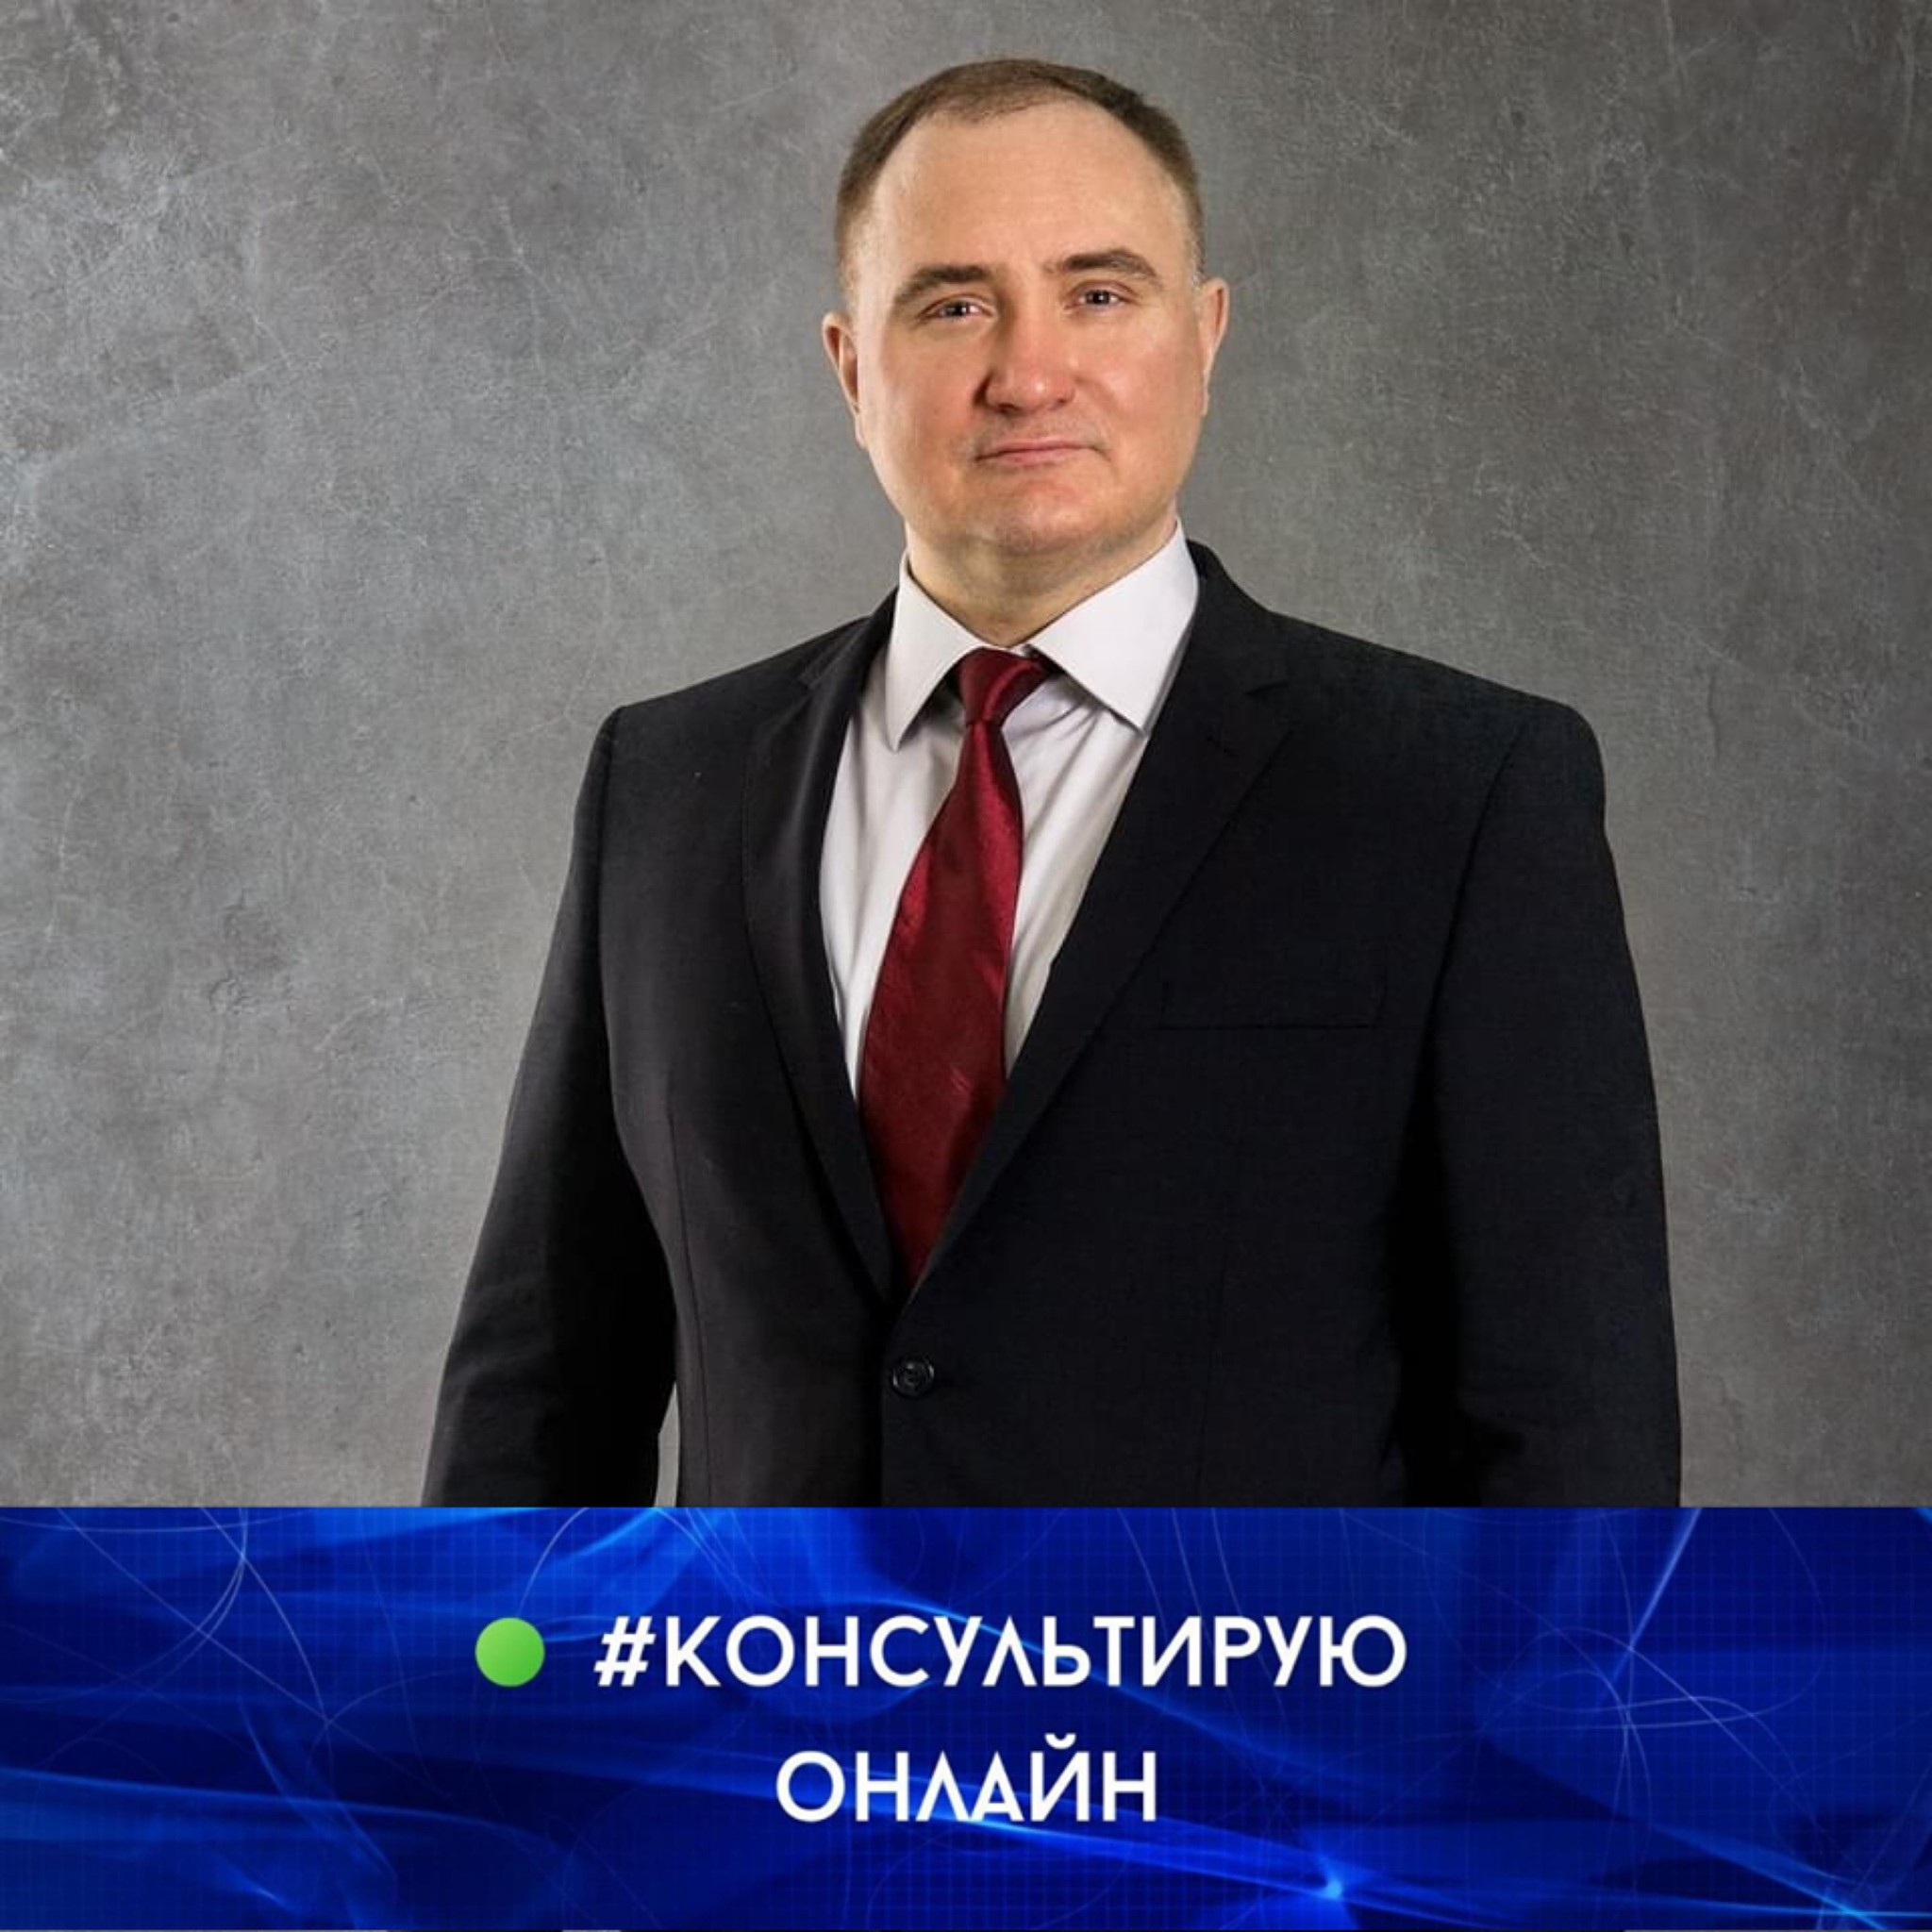 адвокат Татаринов Александр Павлович